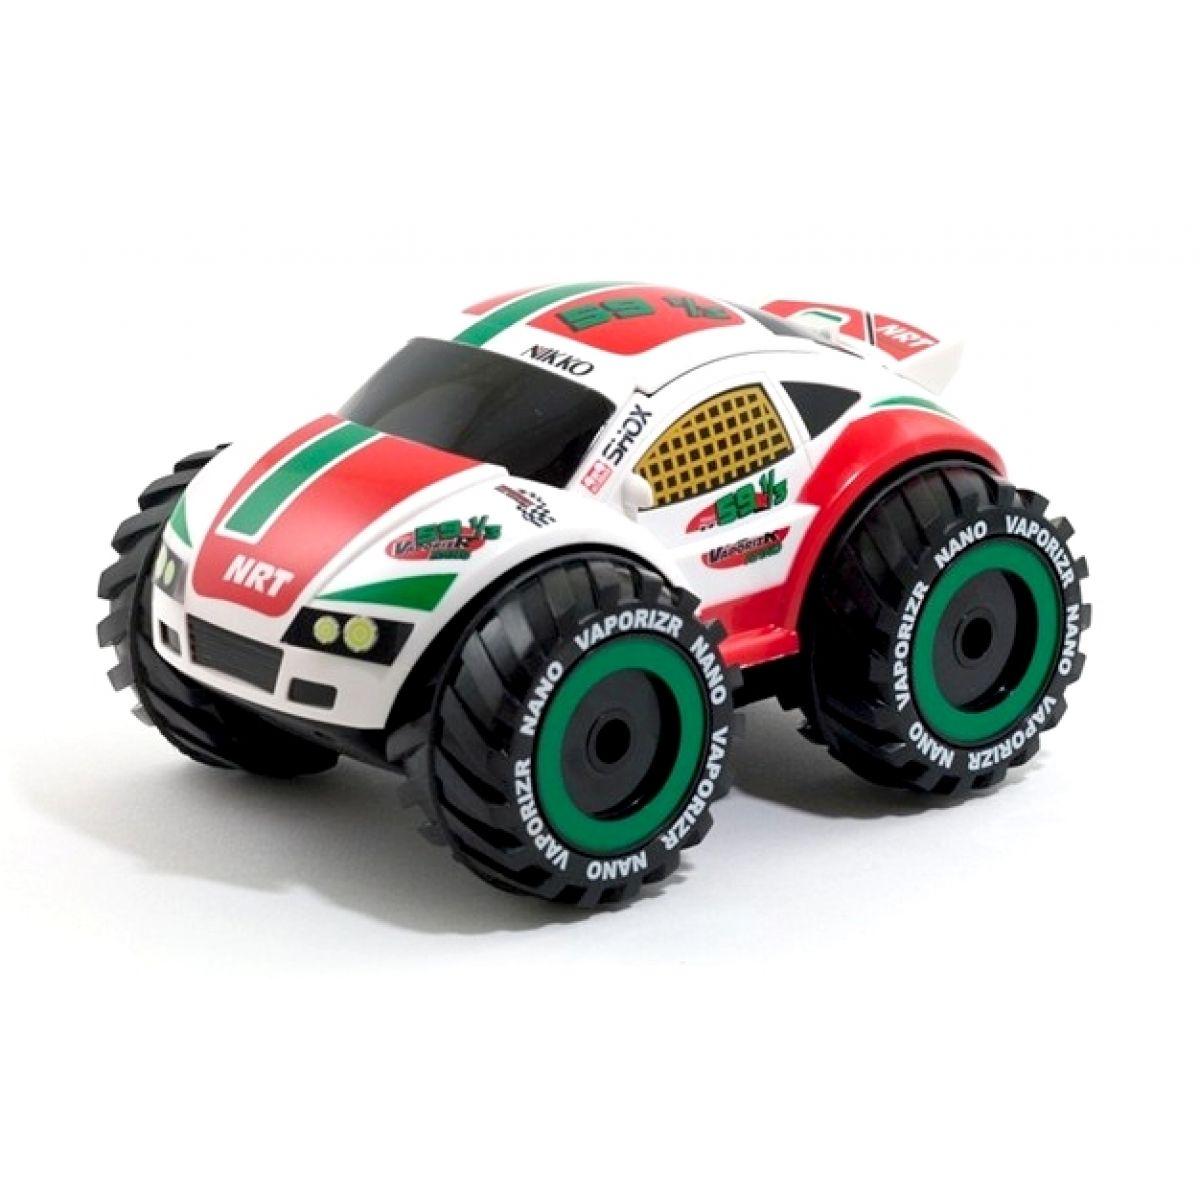 RC Auto Nano VaporizR - Zelená